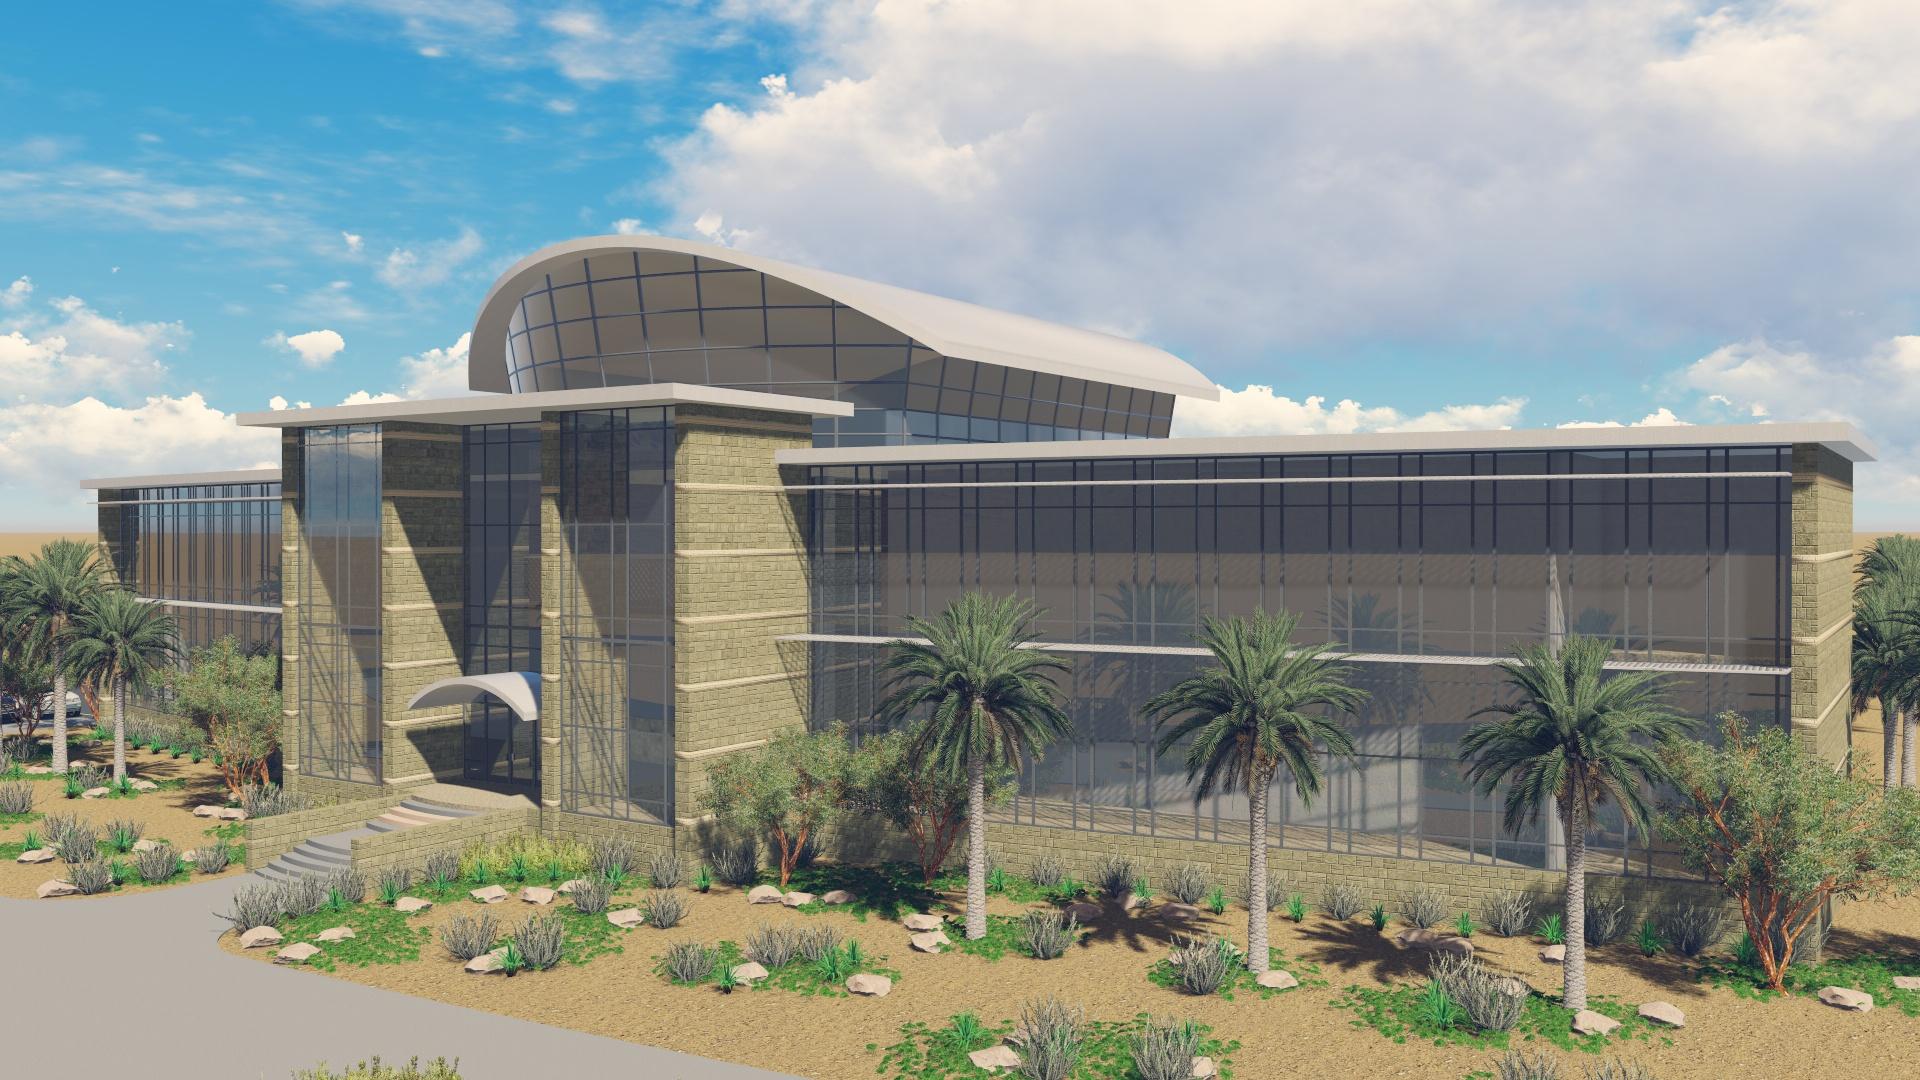 KSAB administration hq rendering